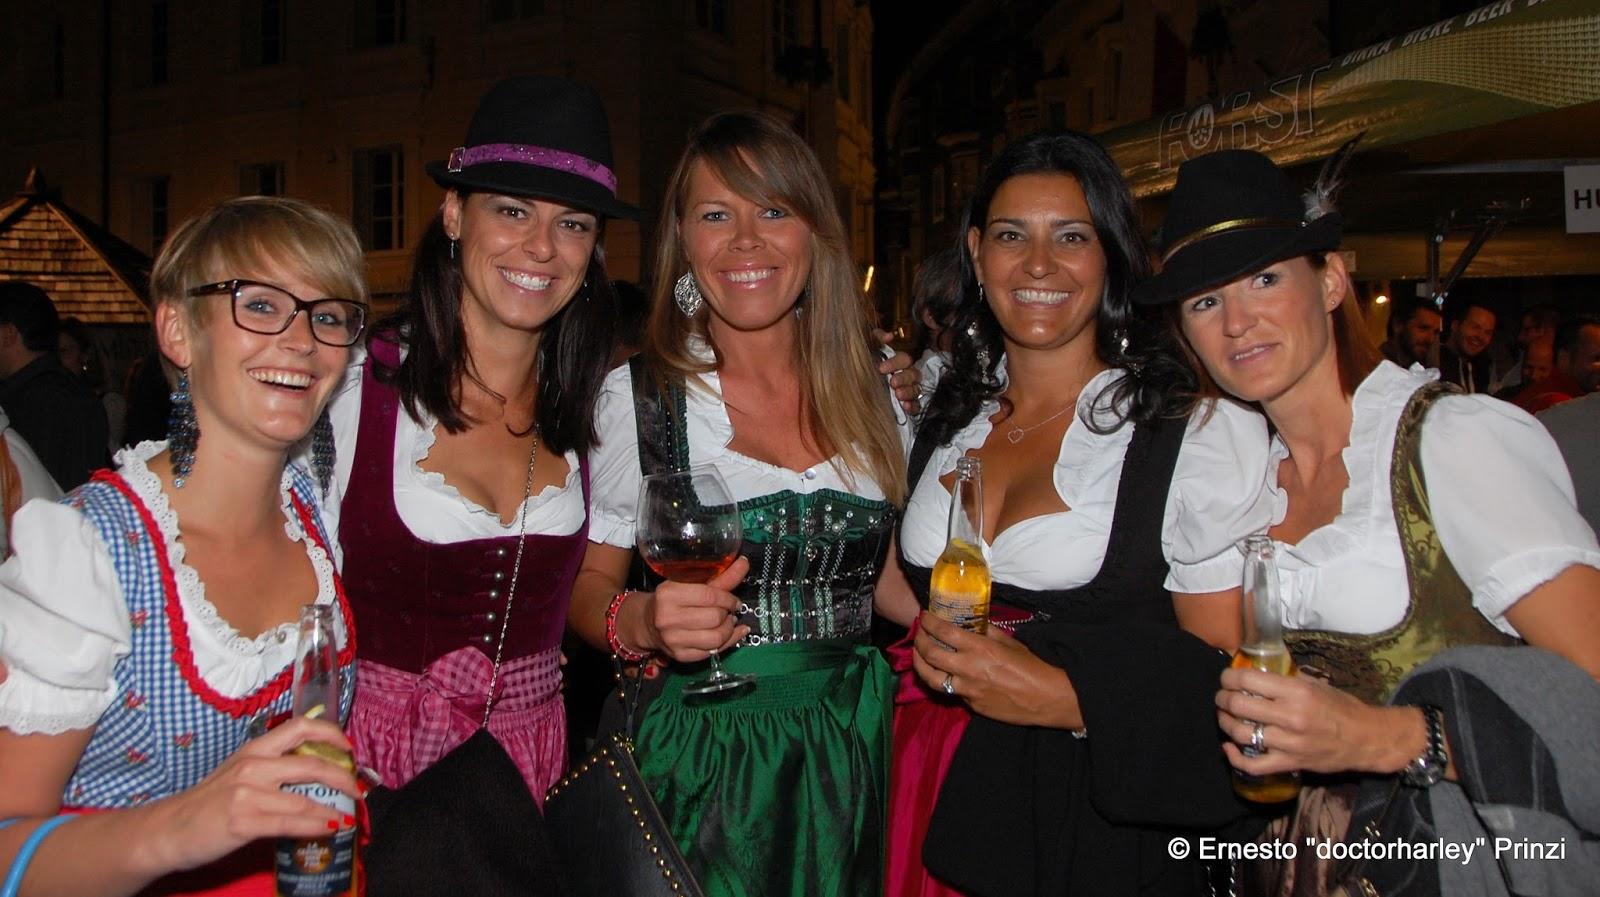 Doctorharley ridereporter for Hotel a bressanone centro storico